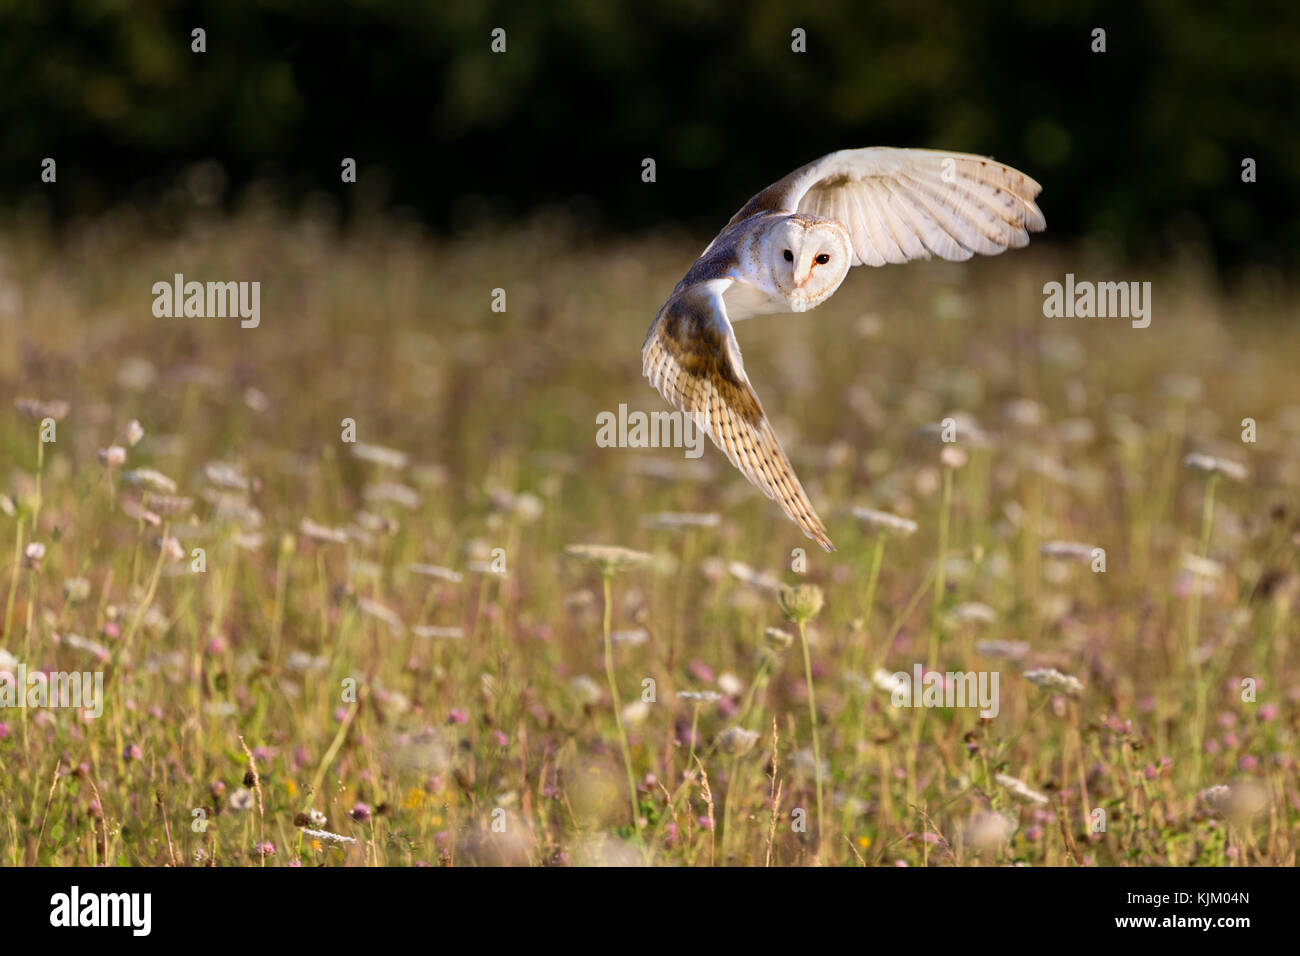 Barn owl in flight - Stock Image